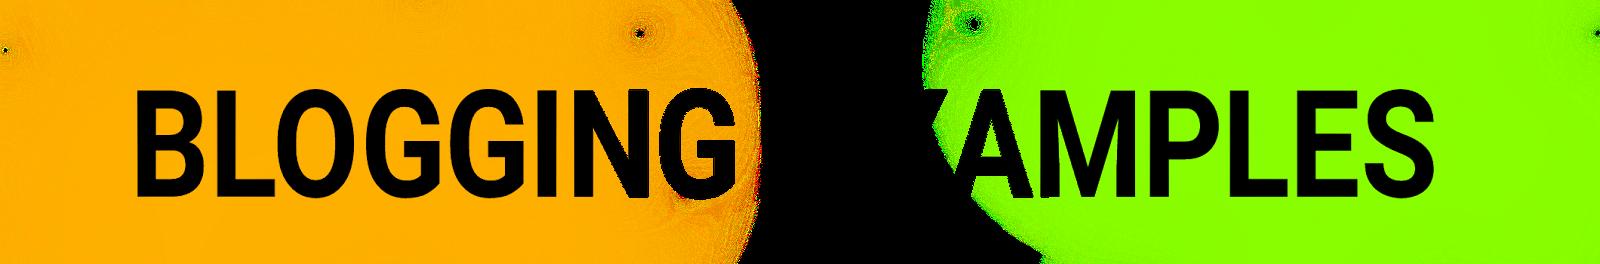 Blogging example